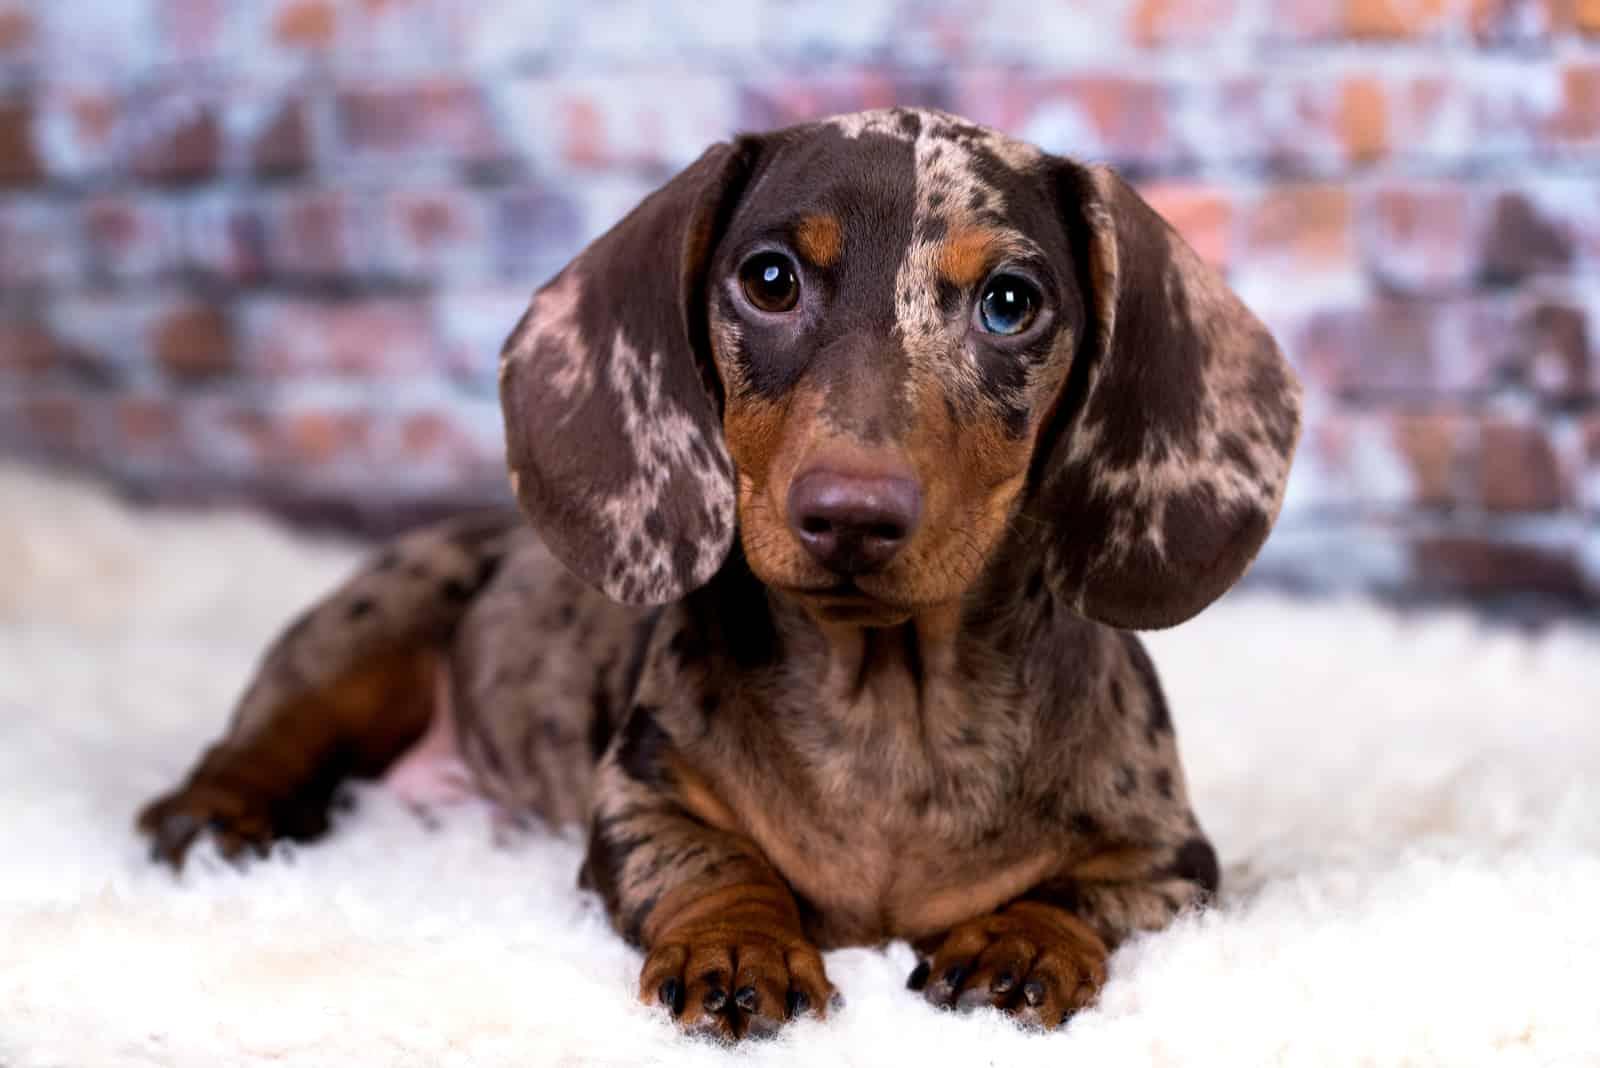 adorable Dachshund dog lying